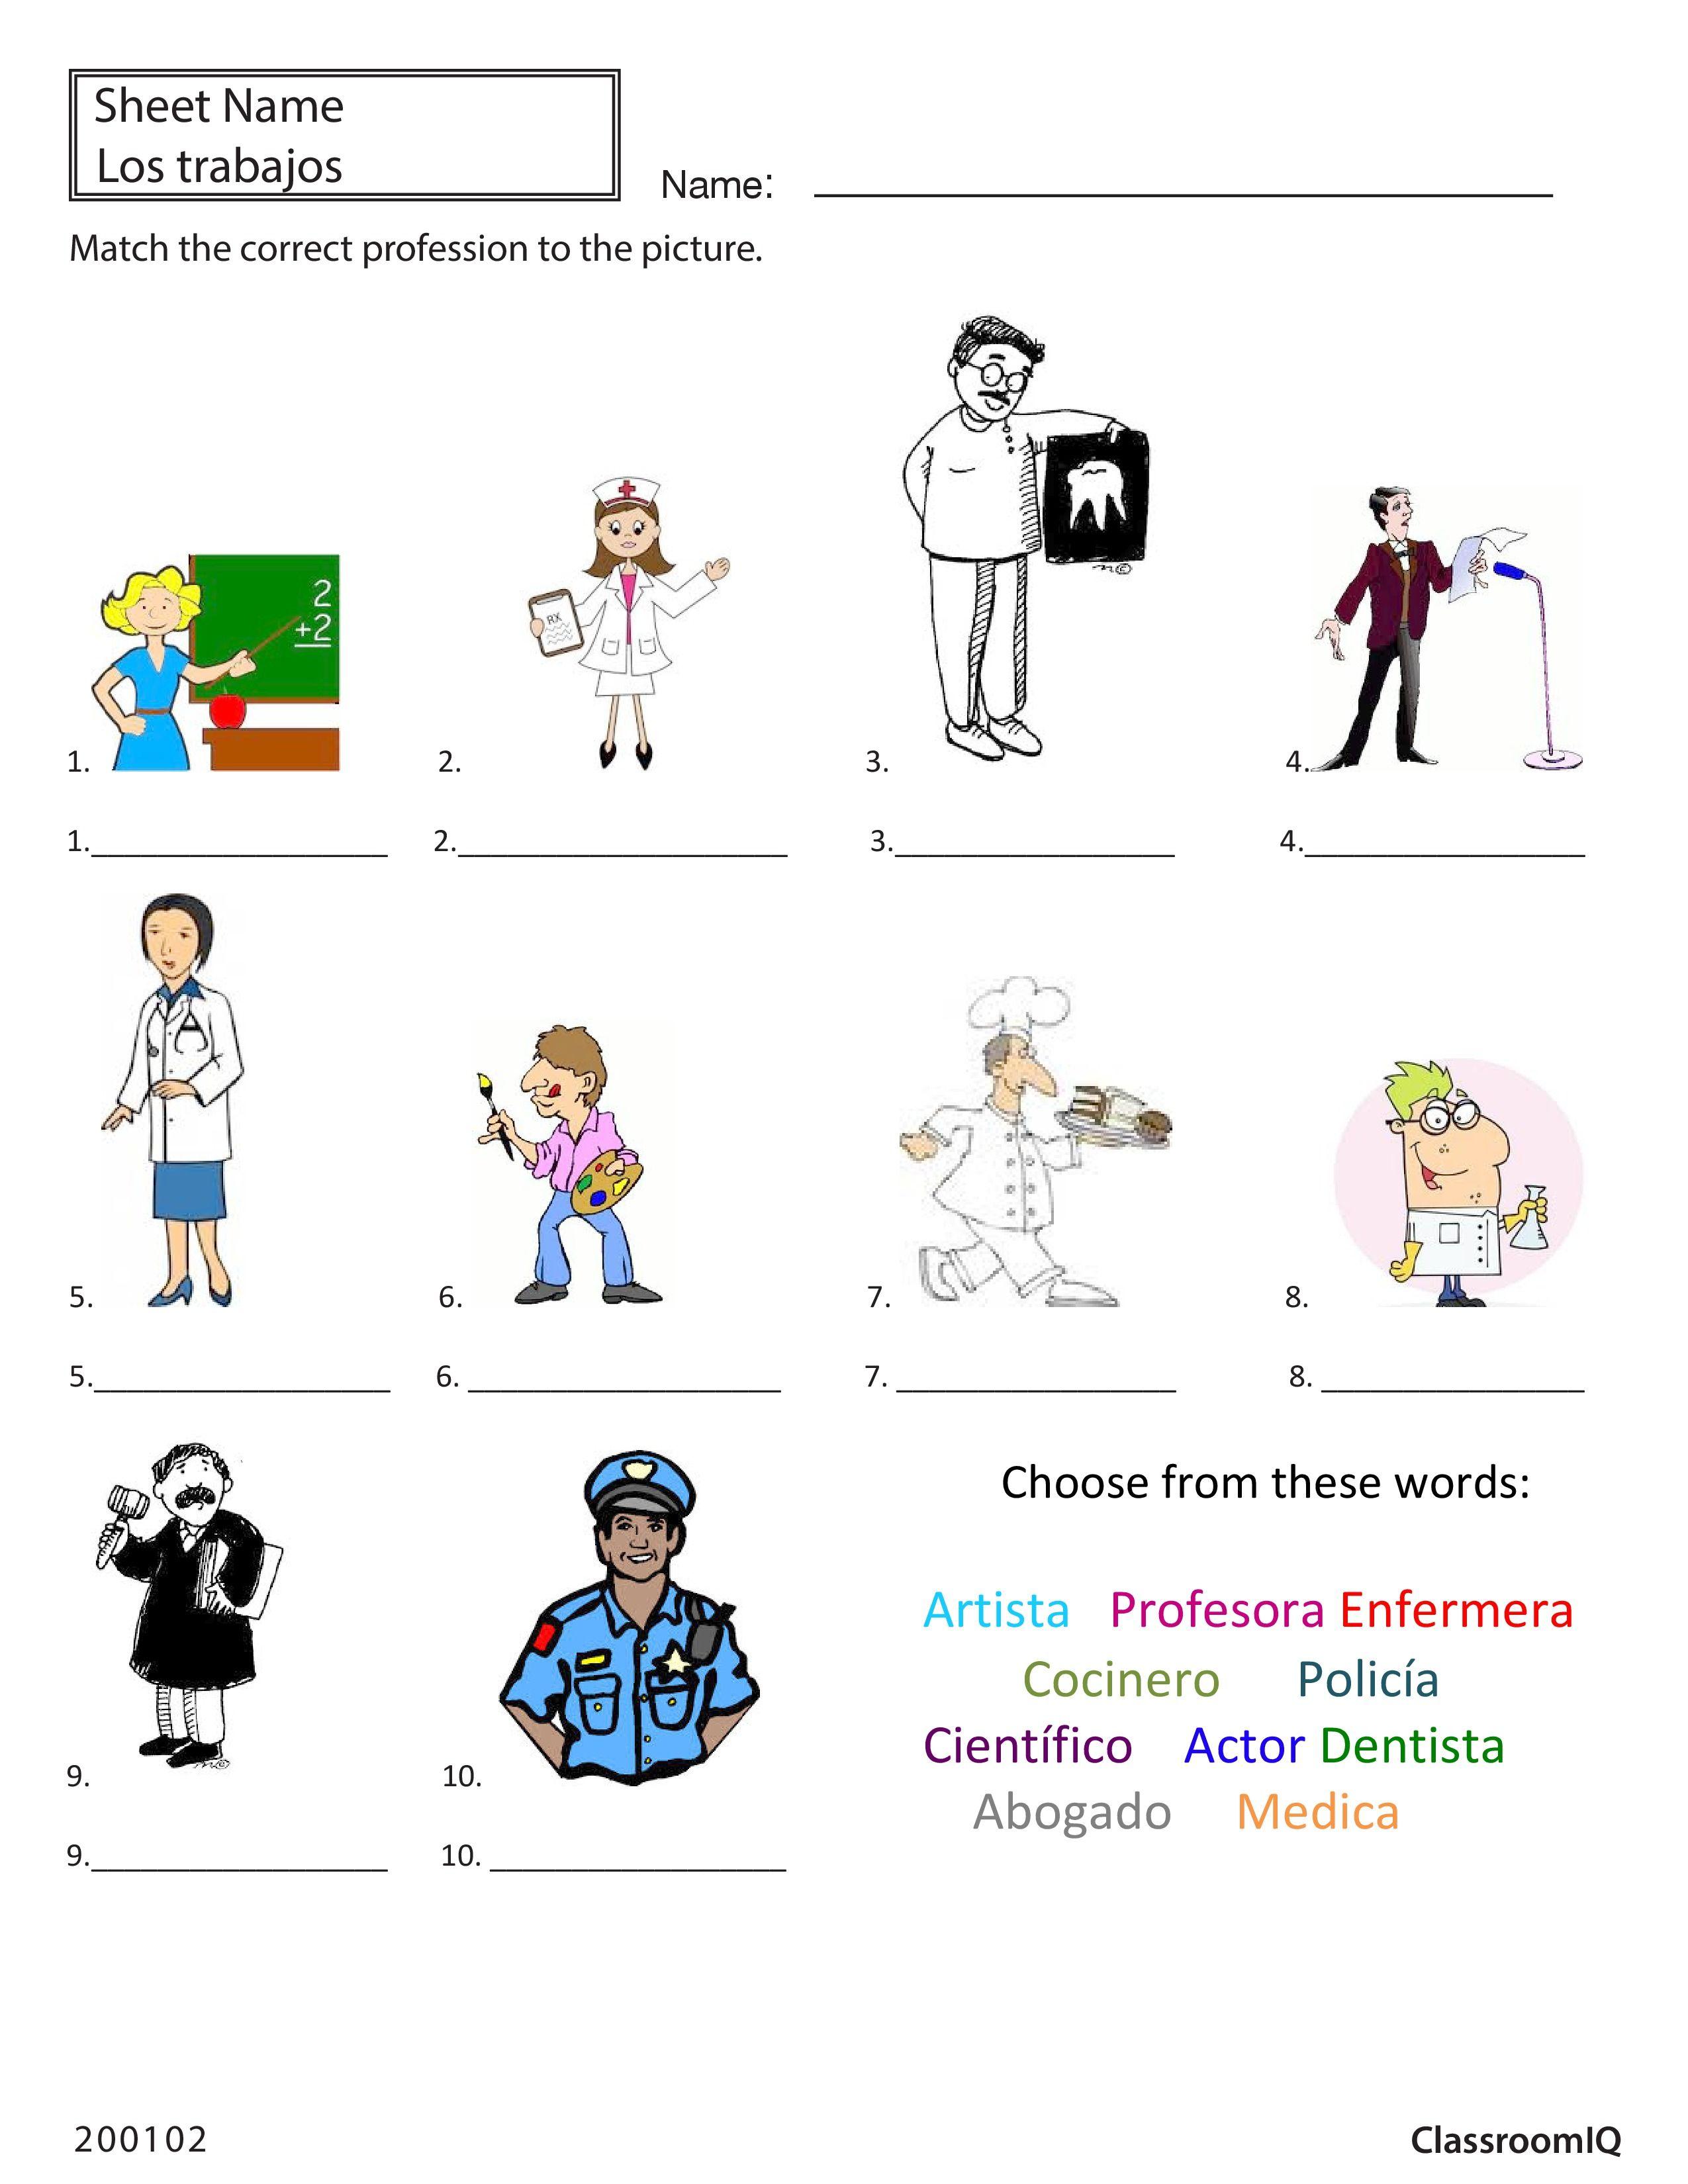 Spanish Professions Worksheet From Classroomiq